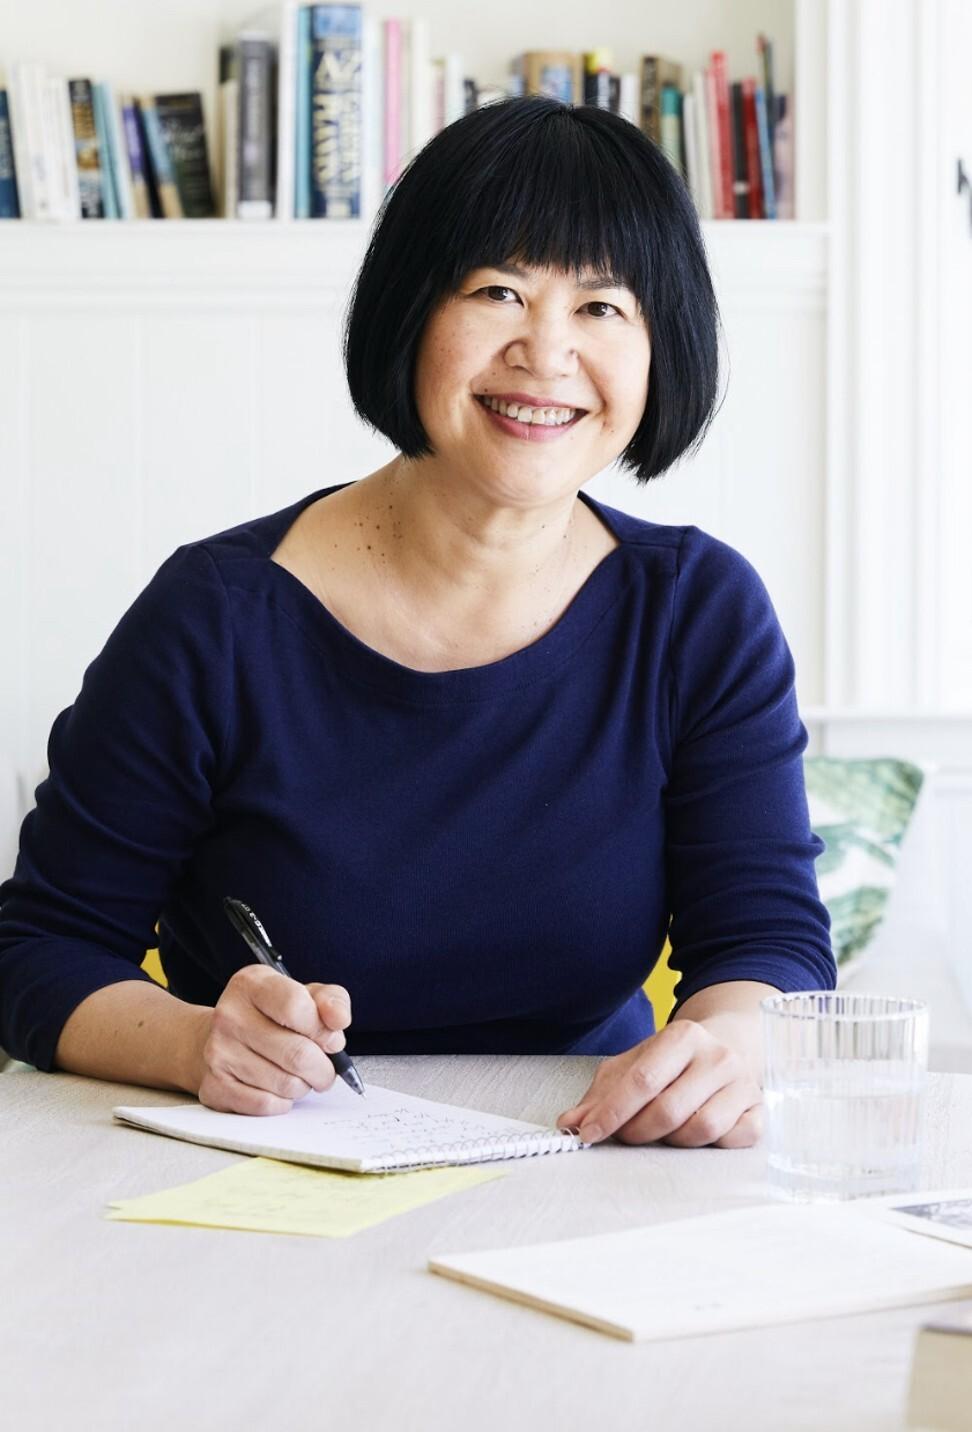 Vietnamese cuisine expert and chef Andrea Nguyen.